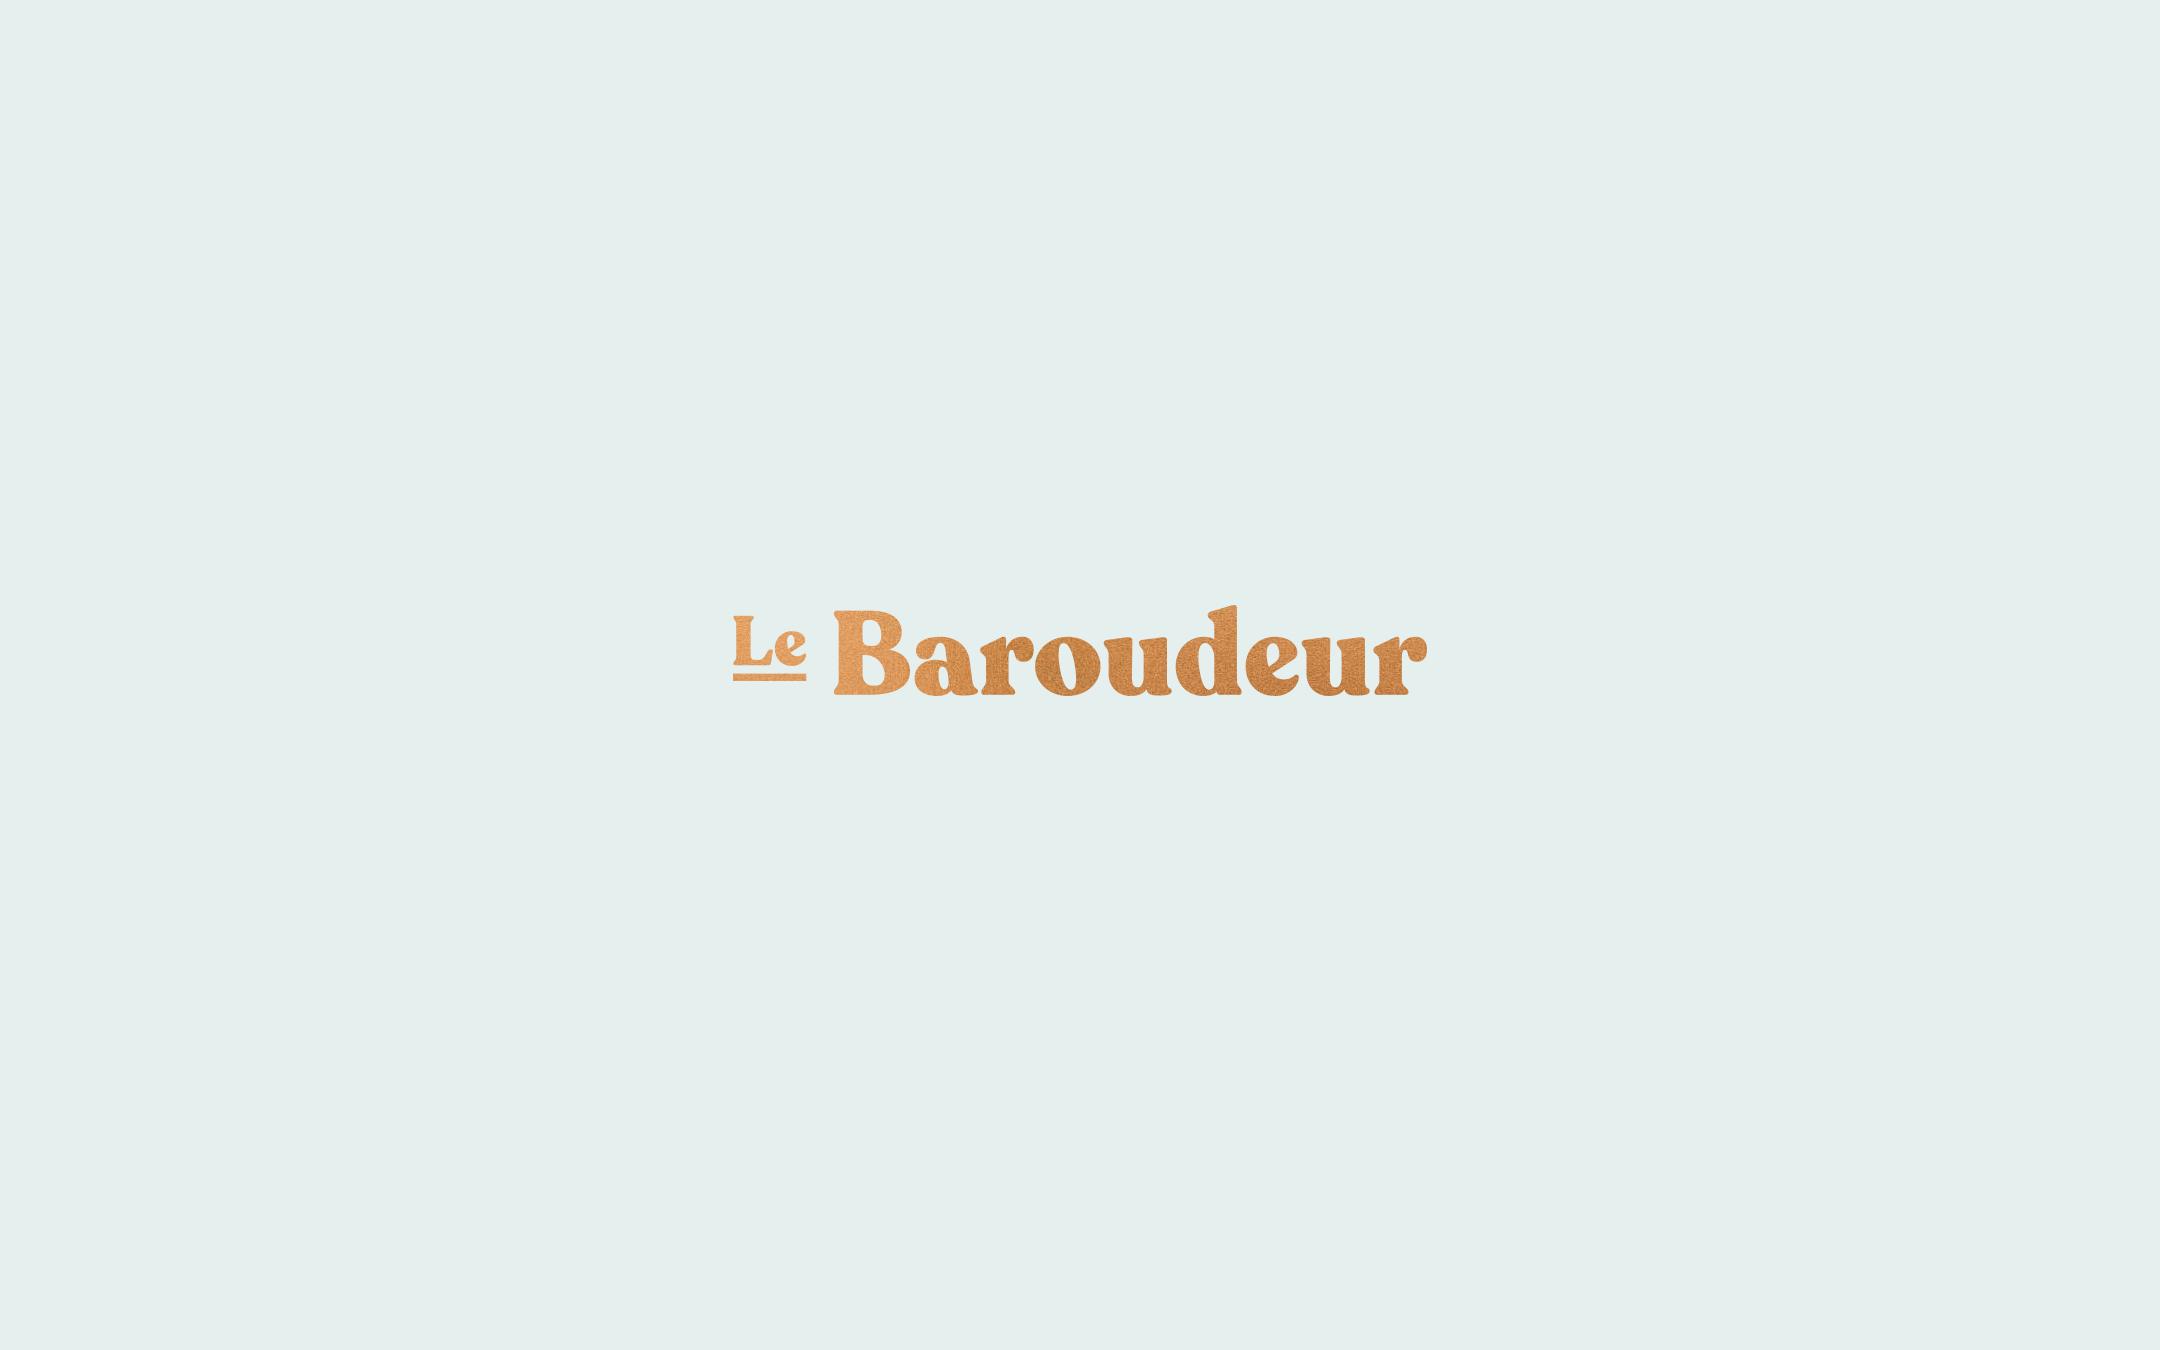 LeBaroudeur_logo_2